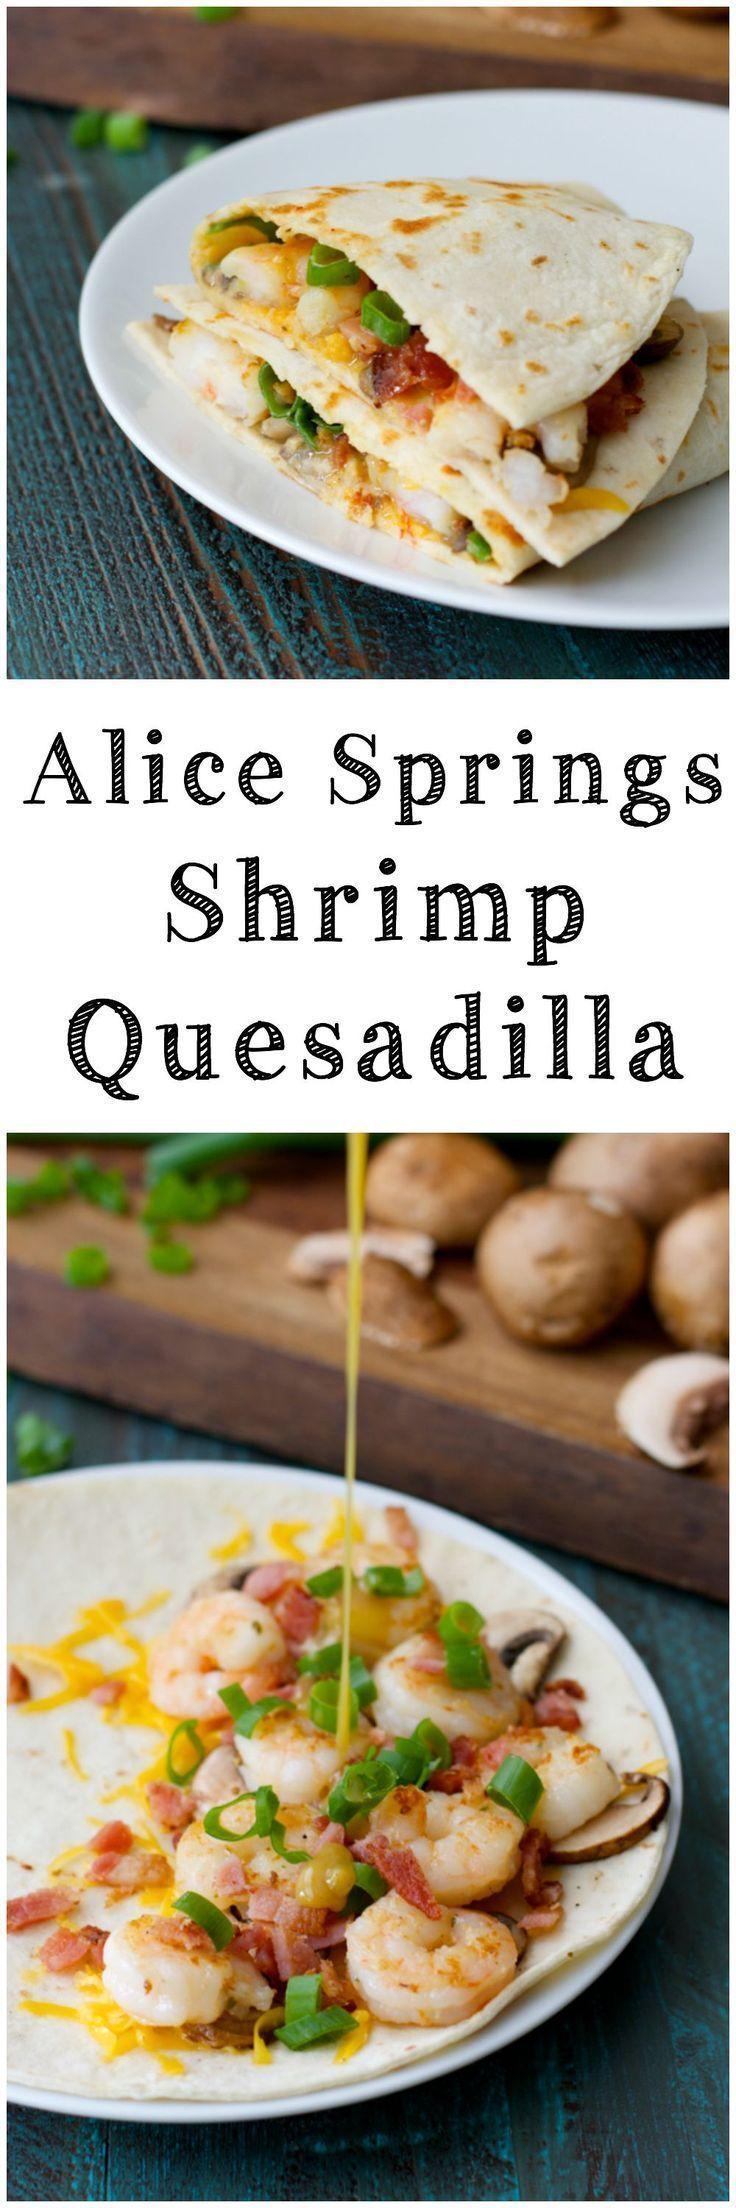 Alice Springs Shrimp Quesadilla! Ready in under 30 minutes!